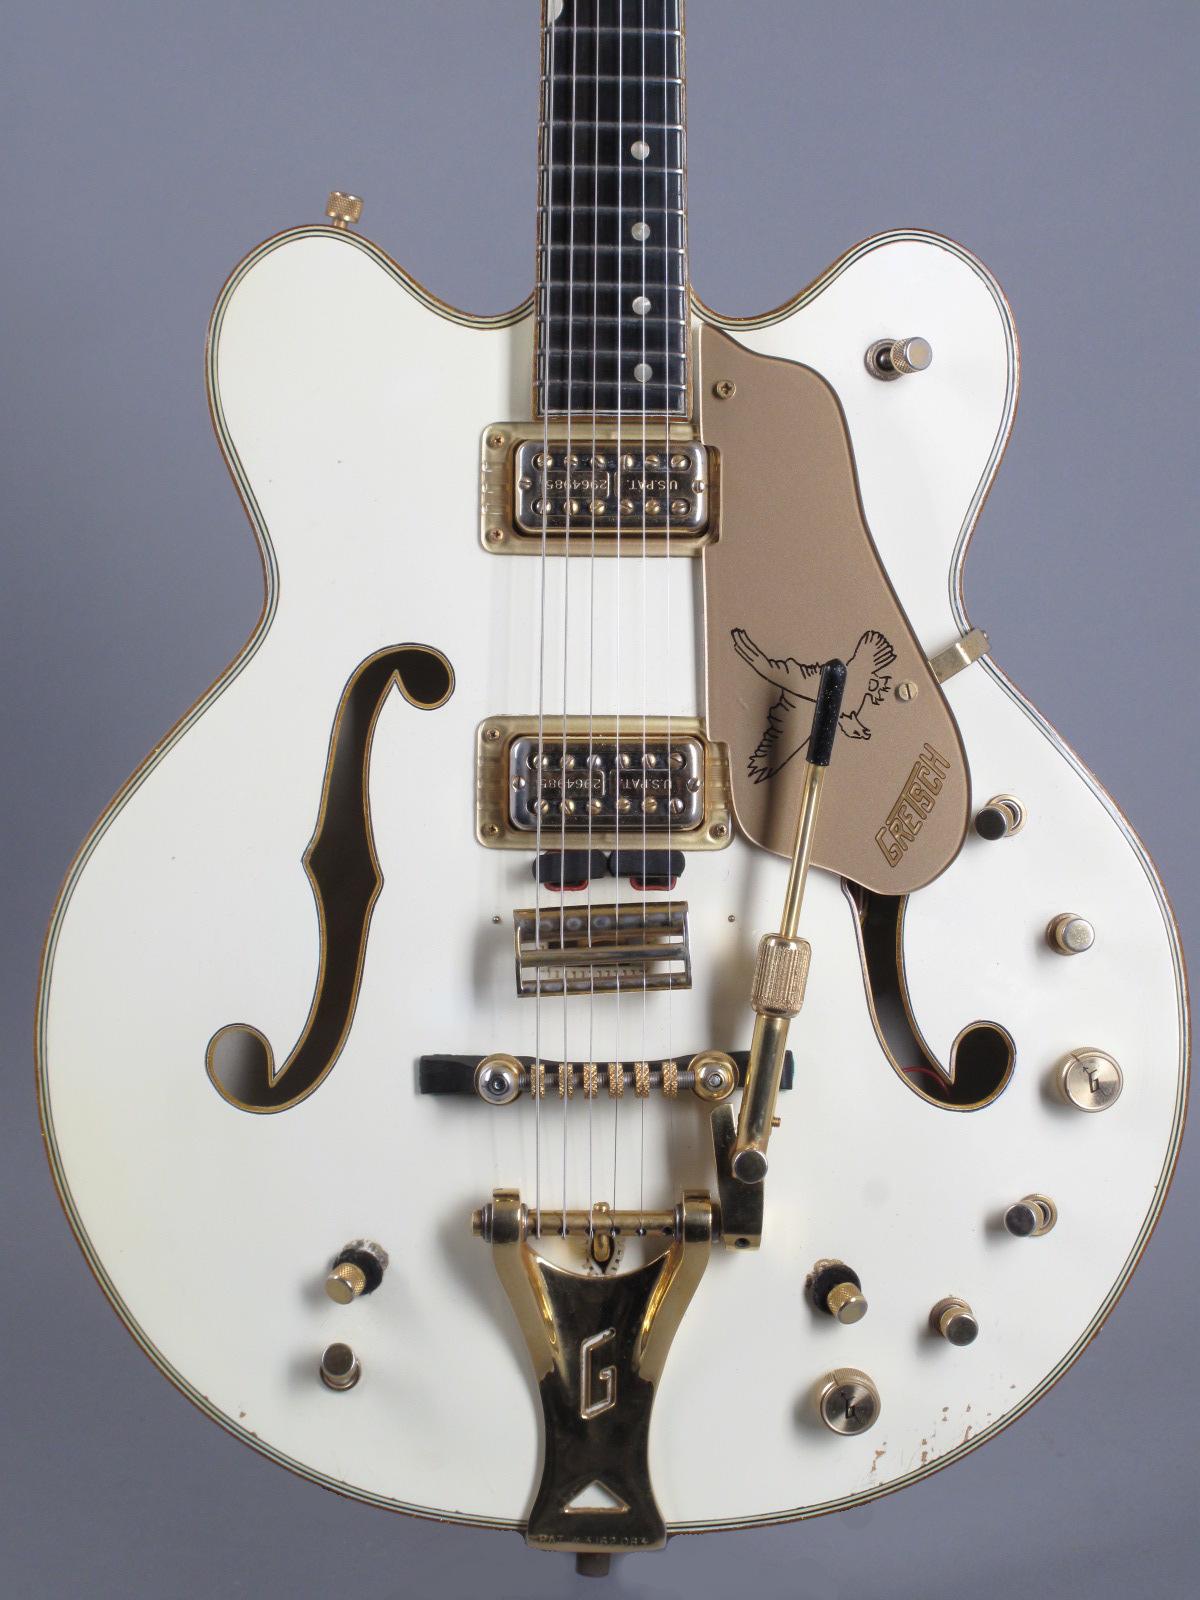 1968 Gretsch 6137 White Falcon / StereoModel